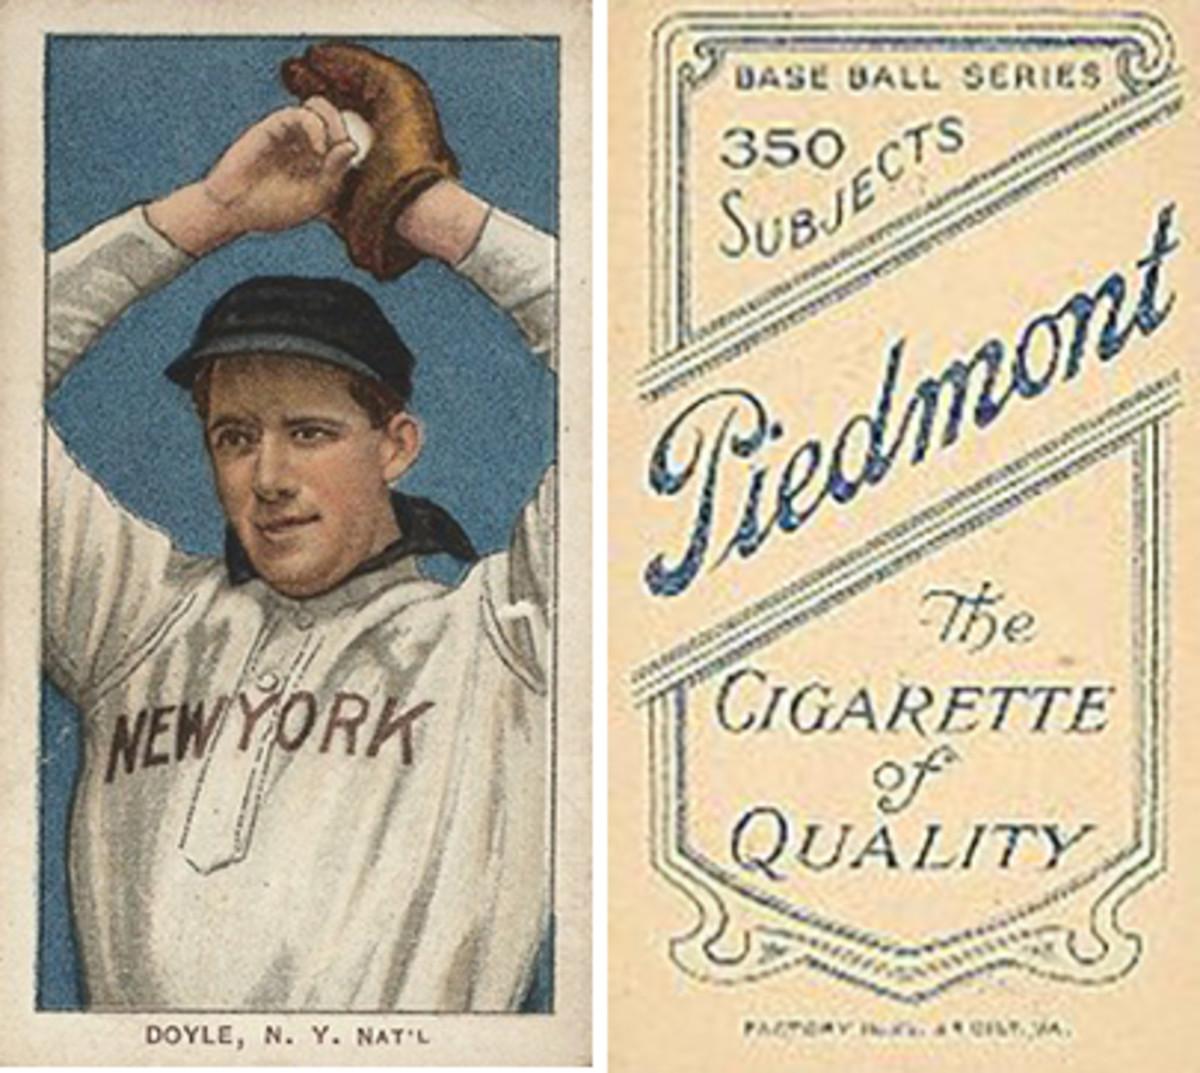 Most Valuable Baseball Cards: Doyle